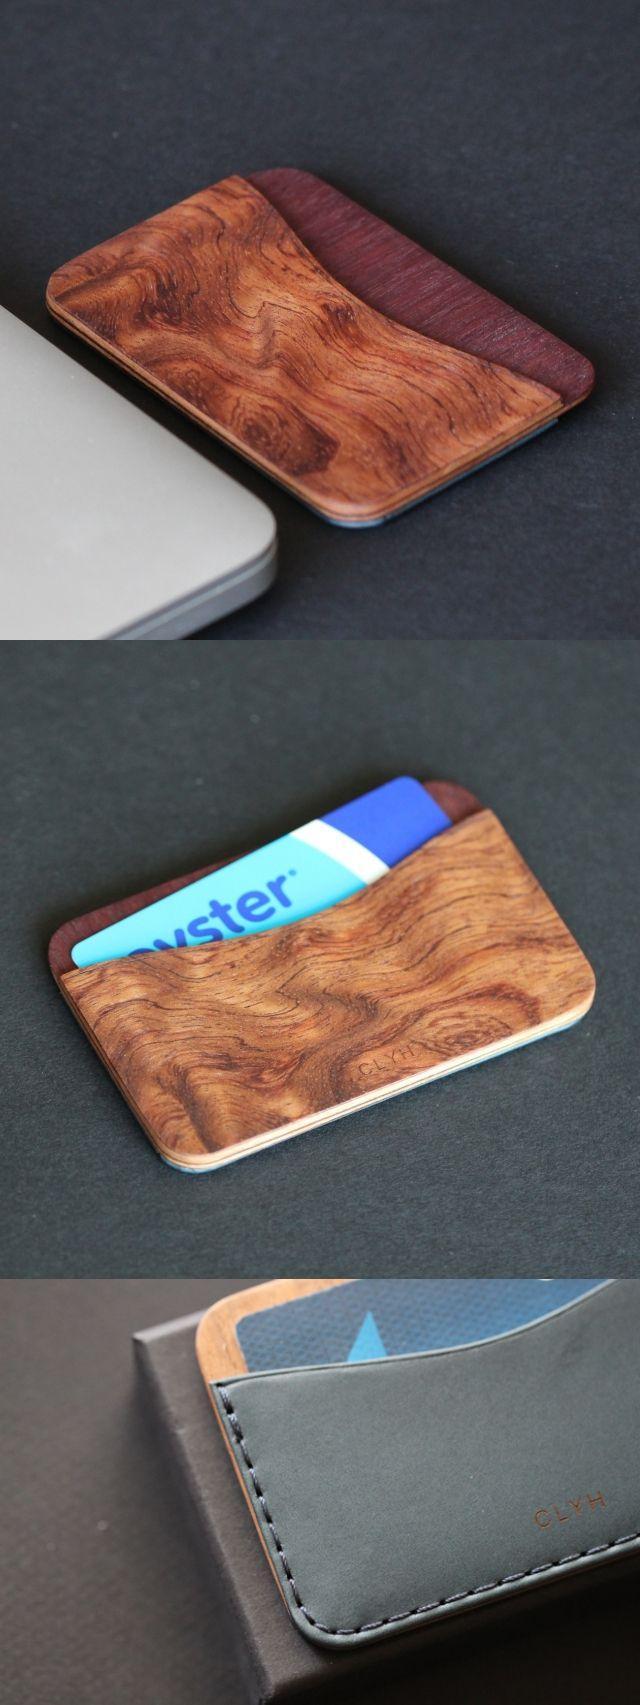 Slim wood wallet designed by IngeniousBros